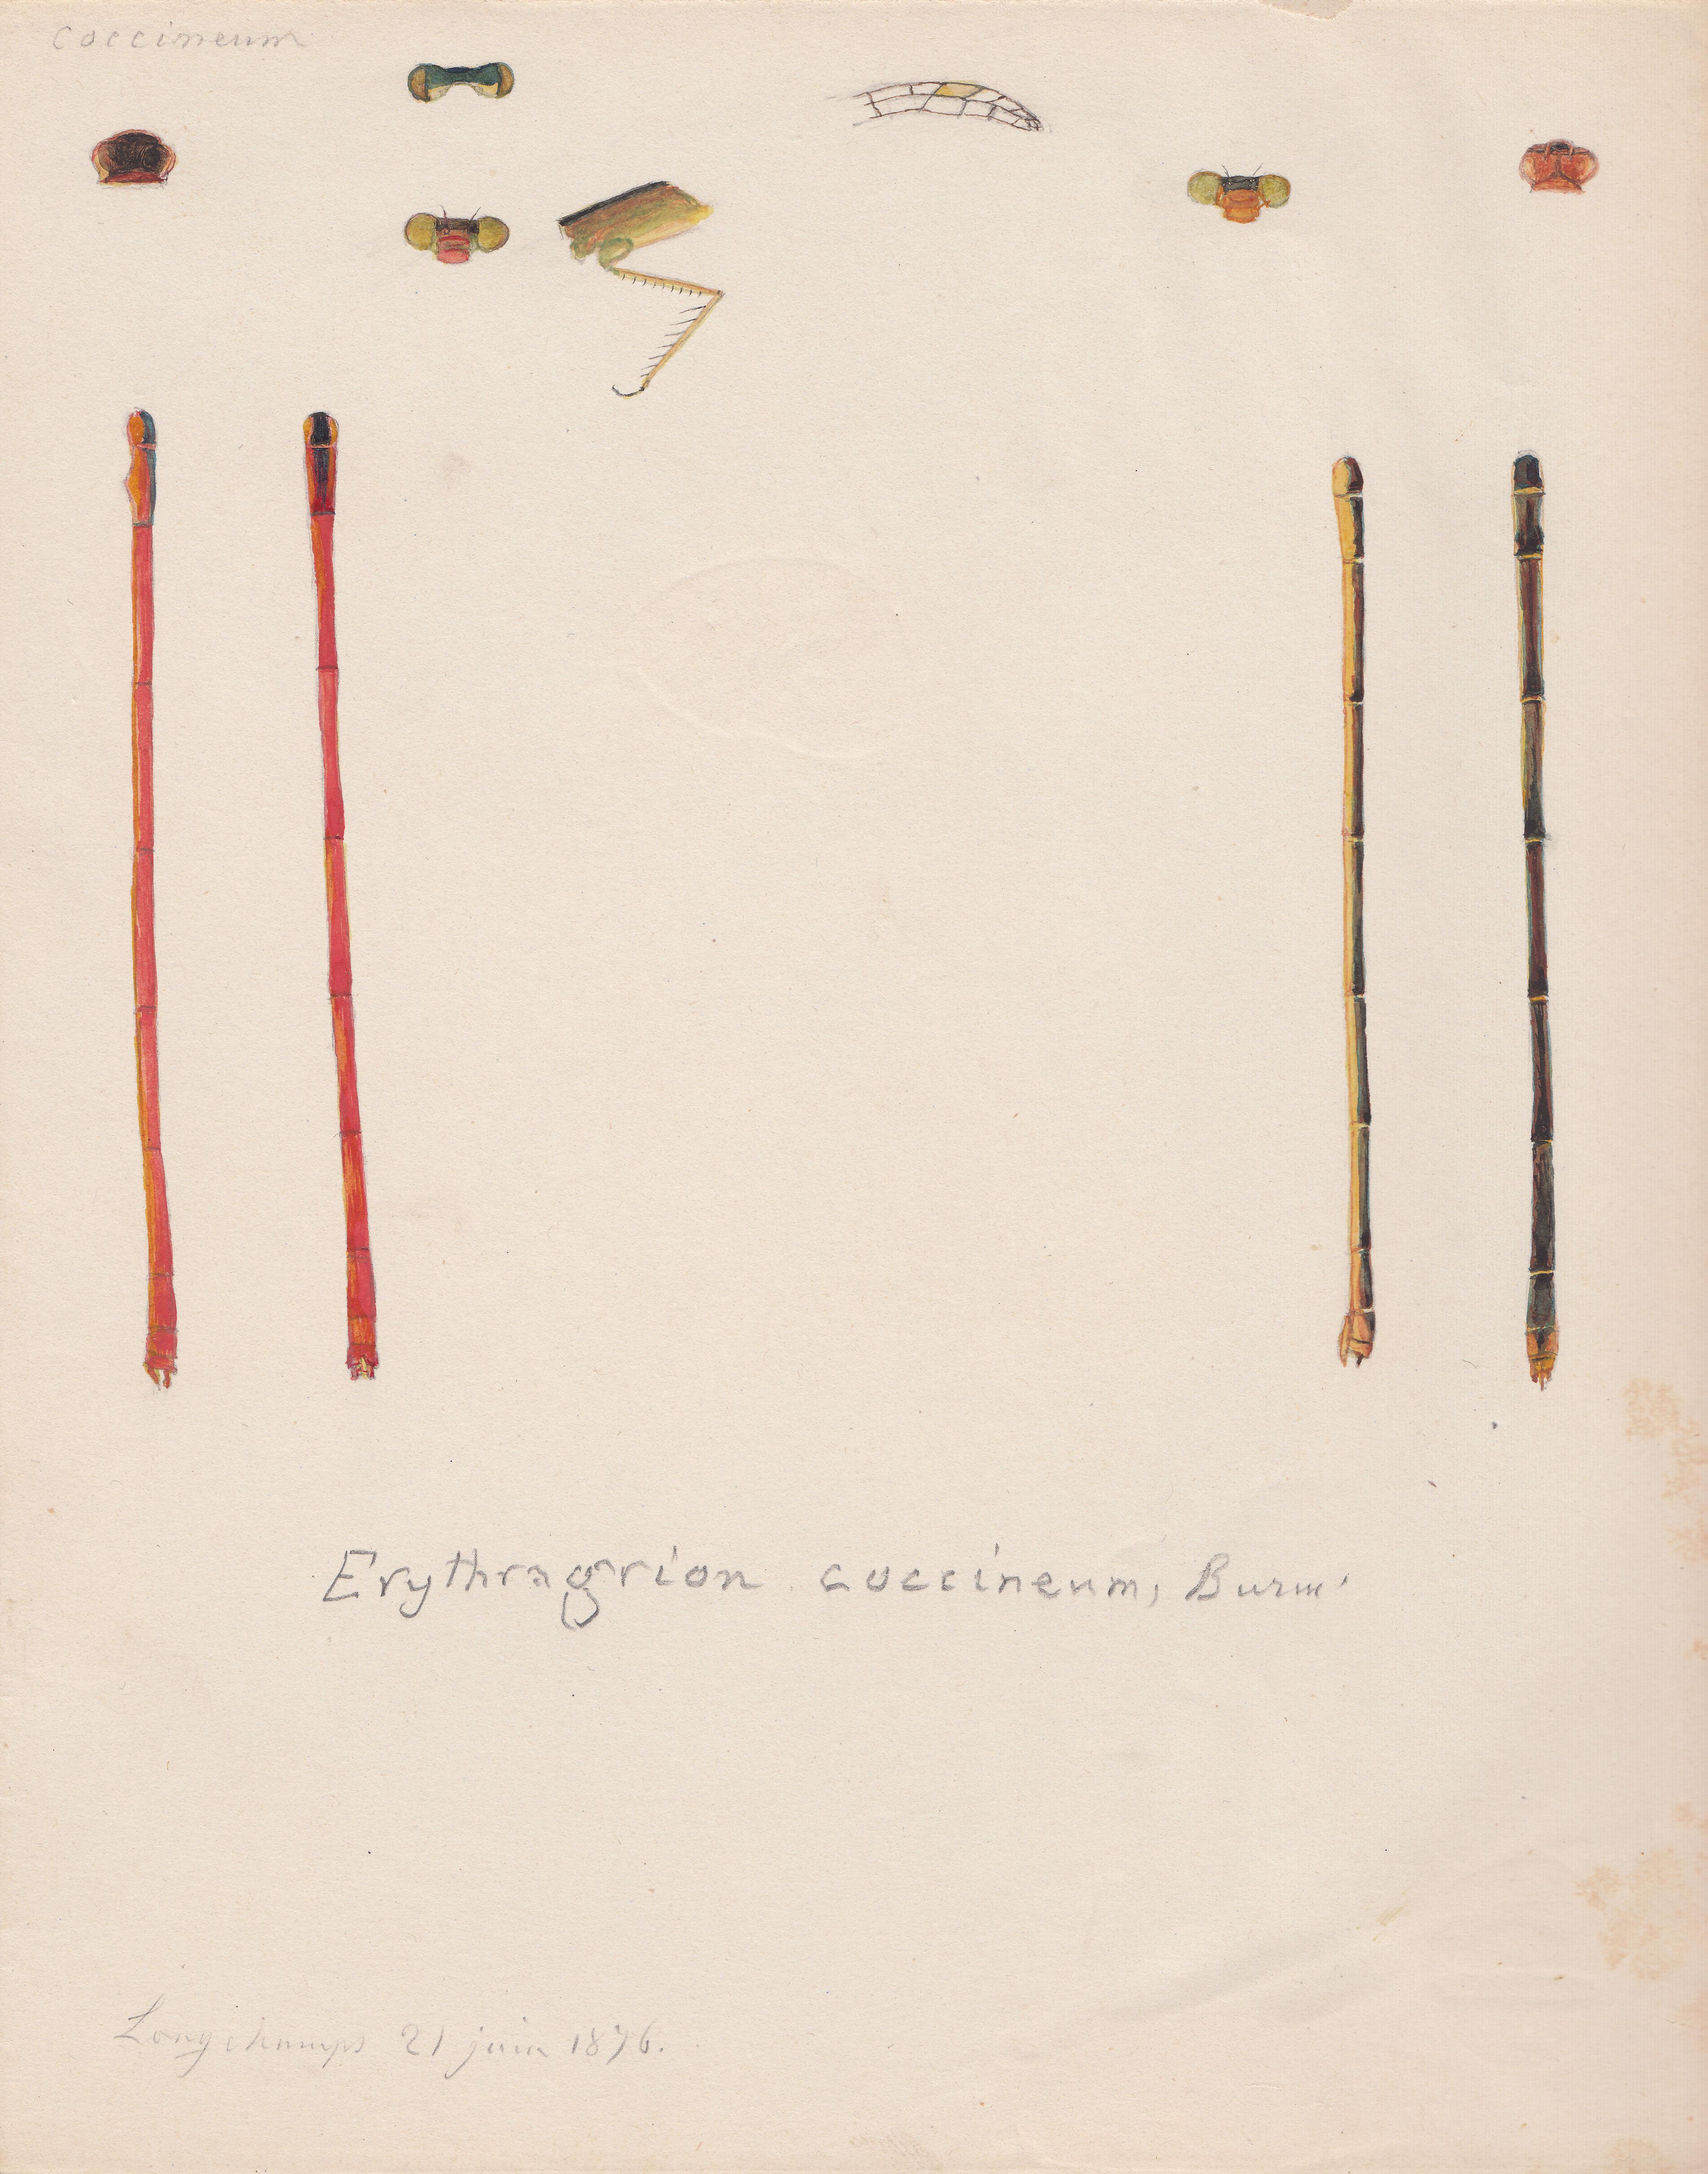 Erythragrion coccineum.jpg